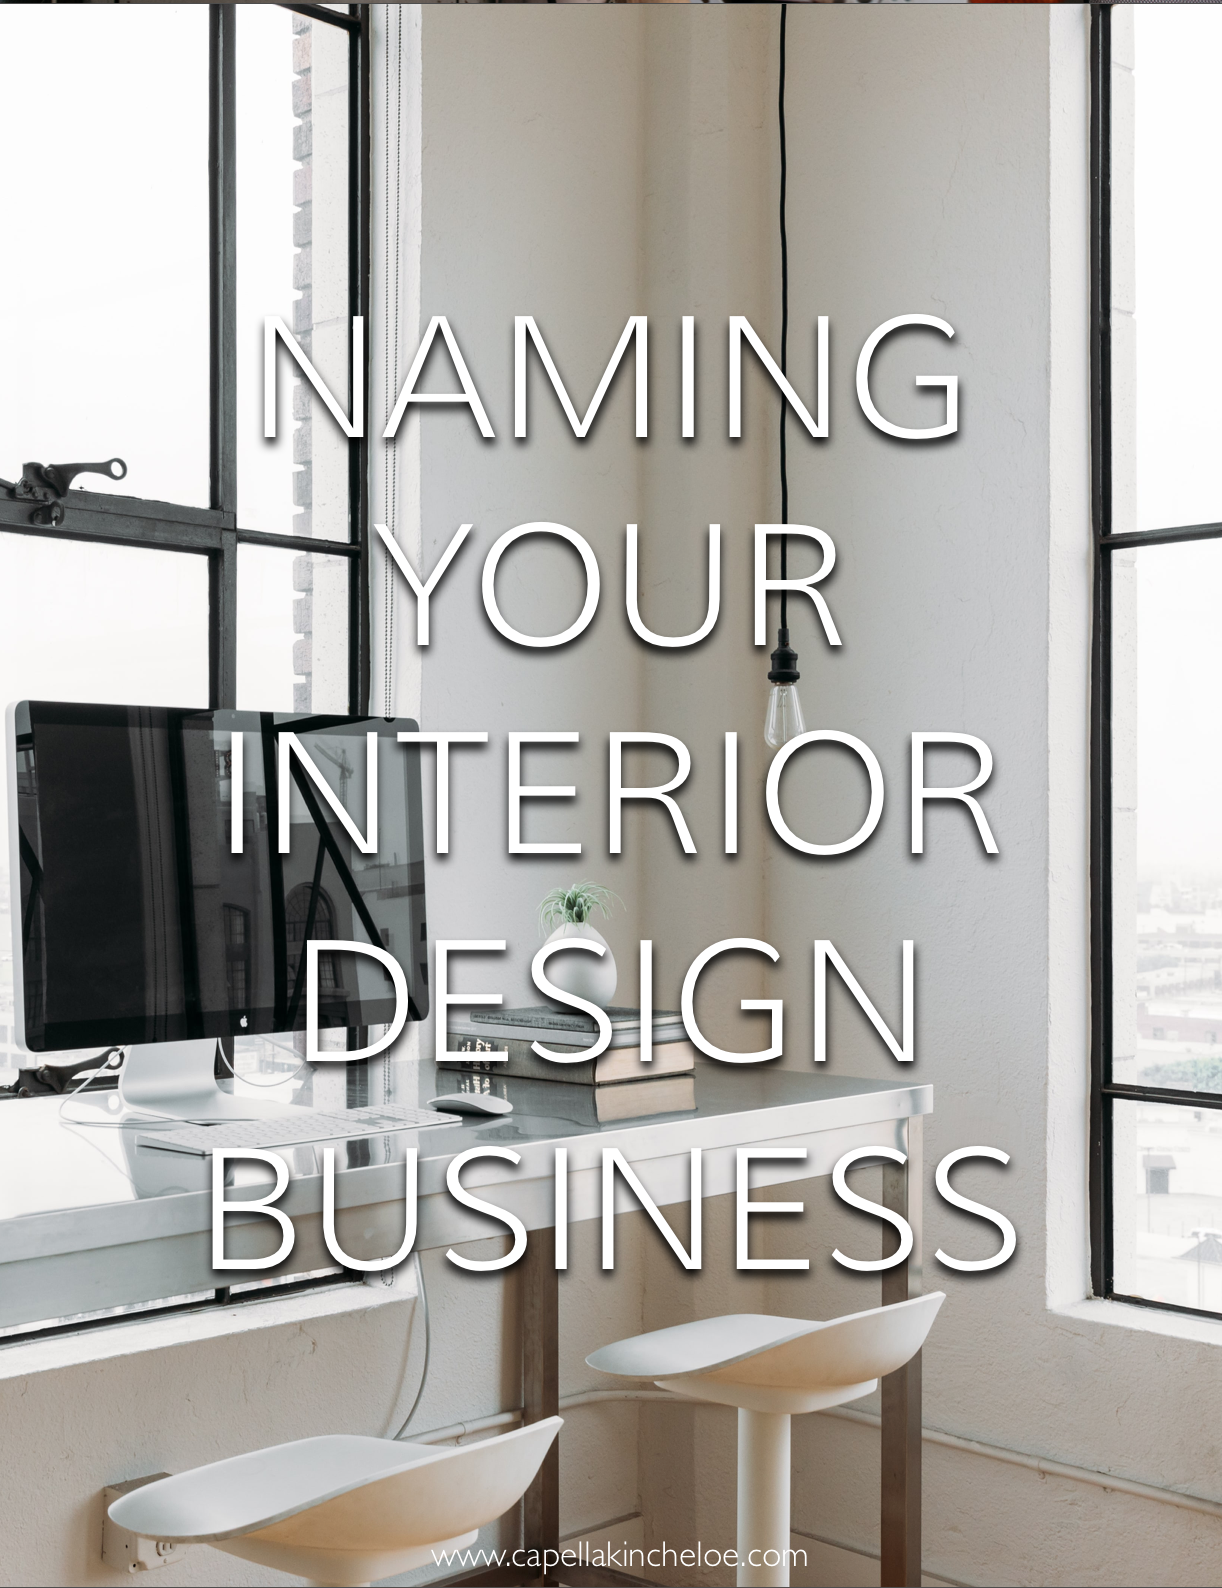 Naming Your Interior Design Business Interior Design Business